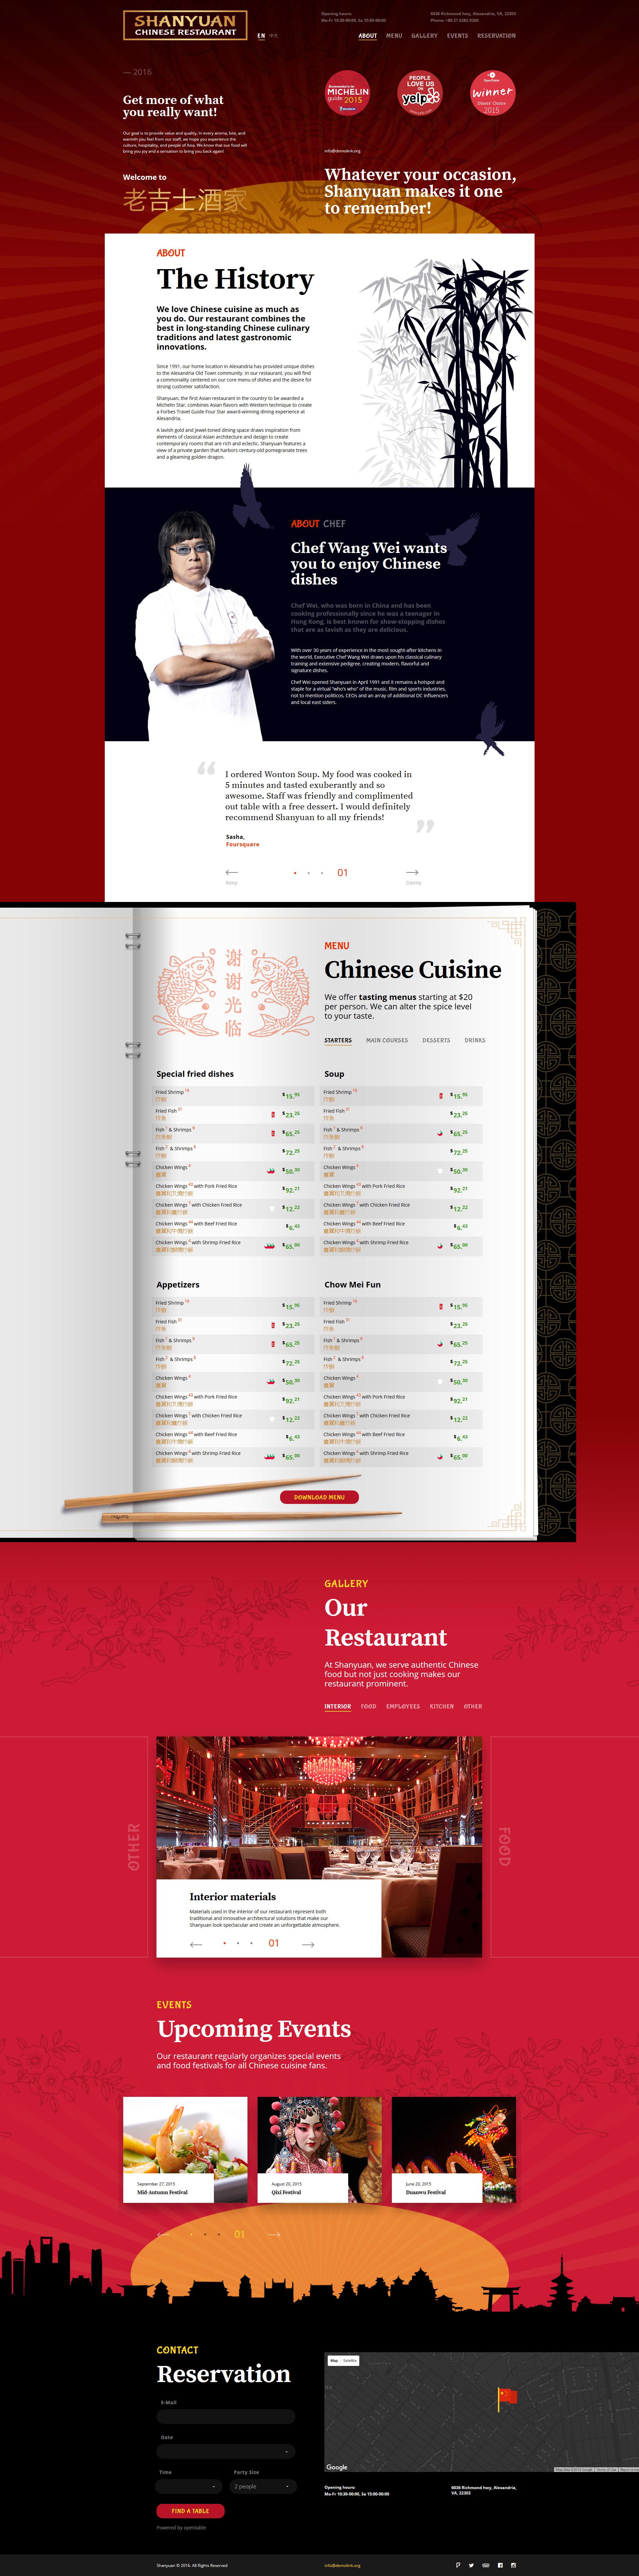 Адаптивный HTML шаблон №58239 на тему китайский ресторан - скриншот